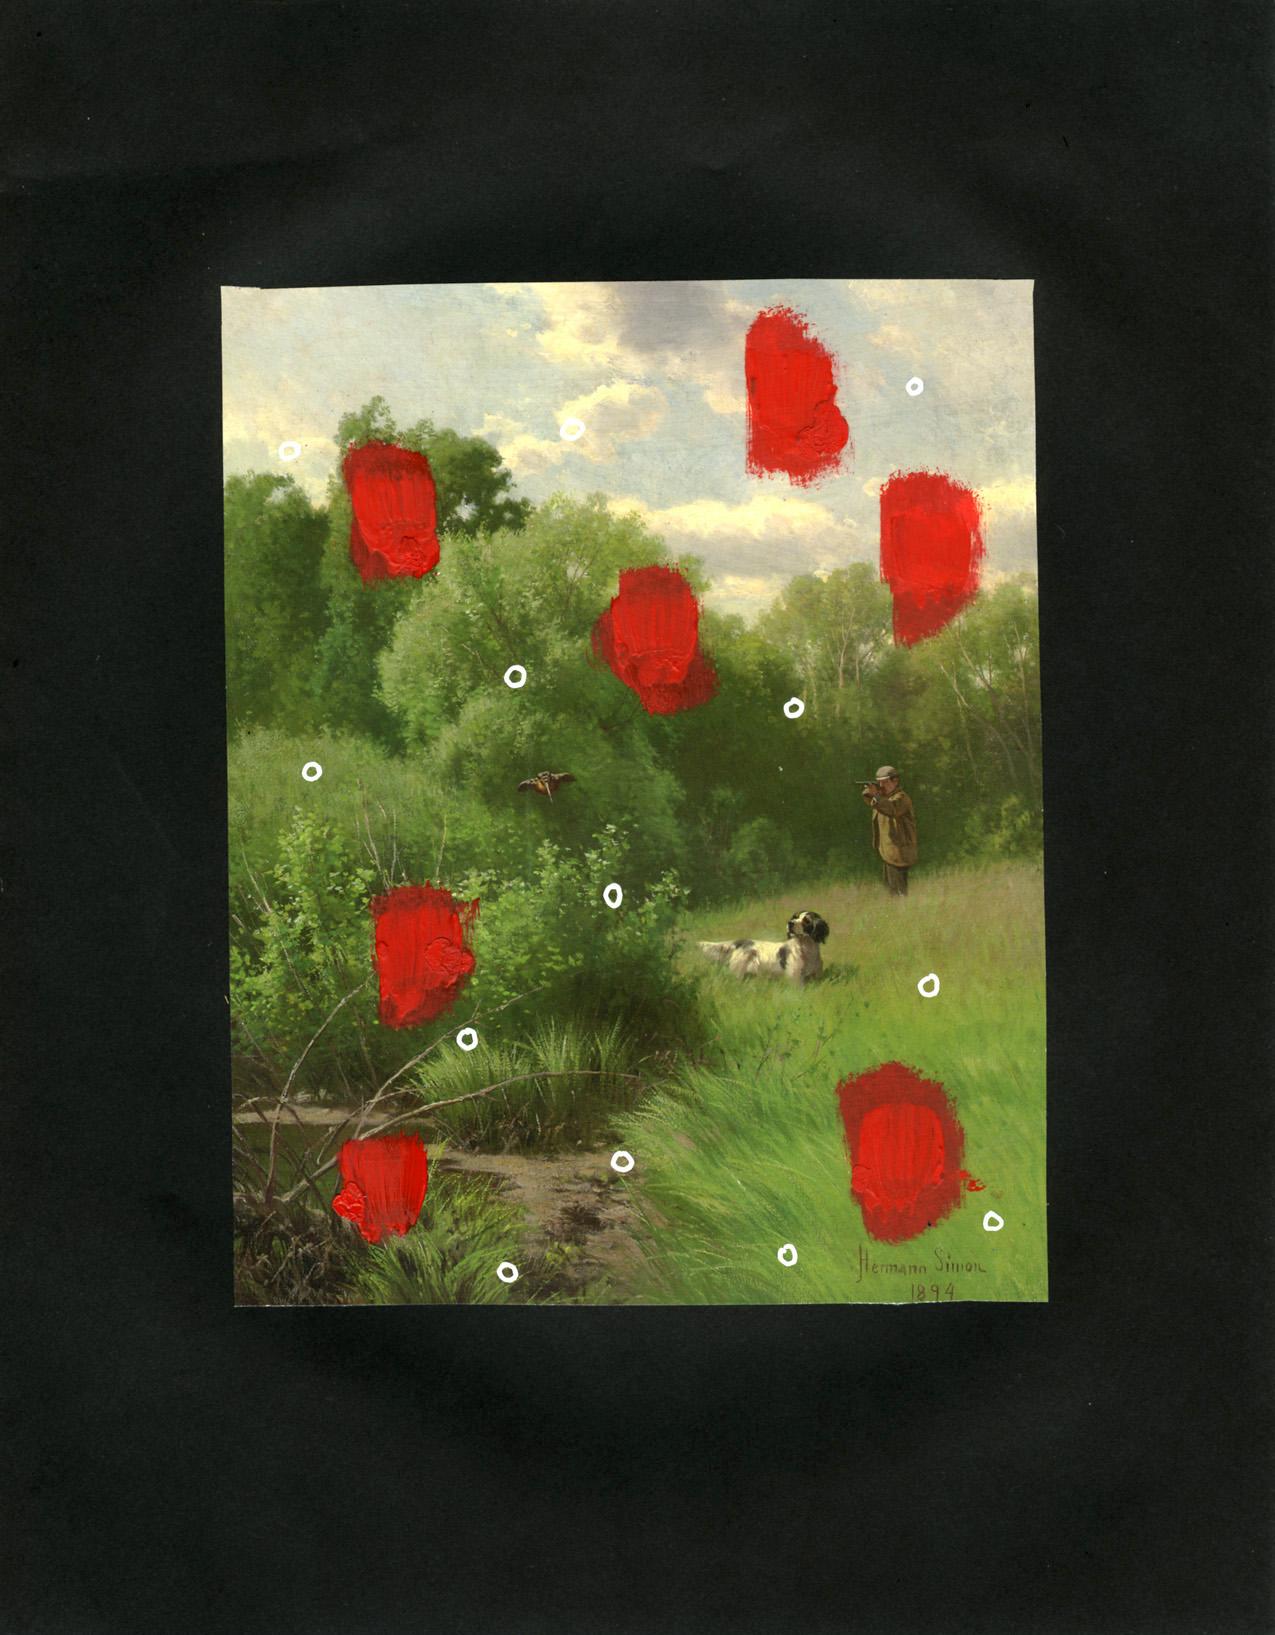 Huntsman  (2005), 11 x 8.5 in, mixed media on paper